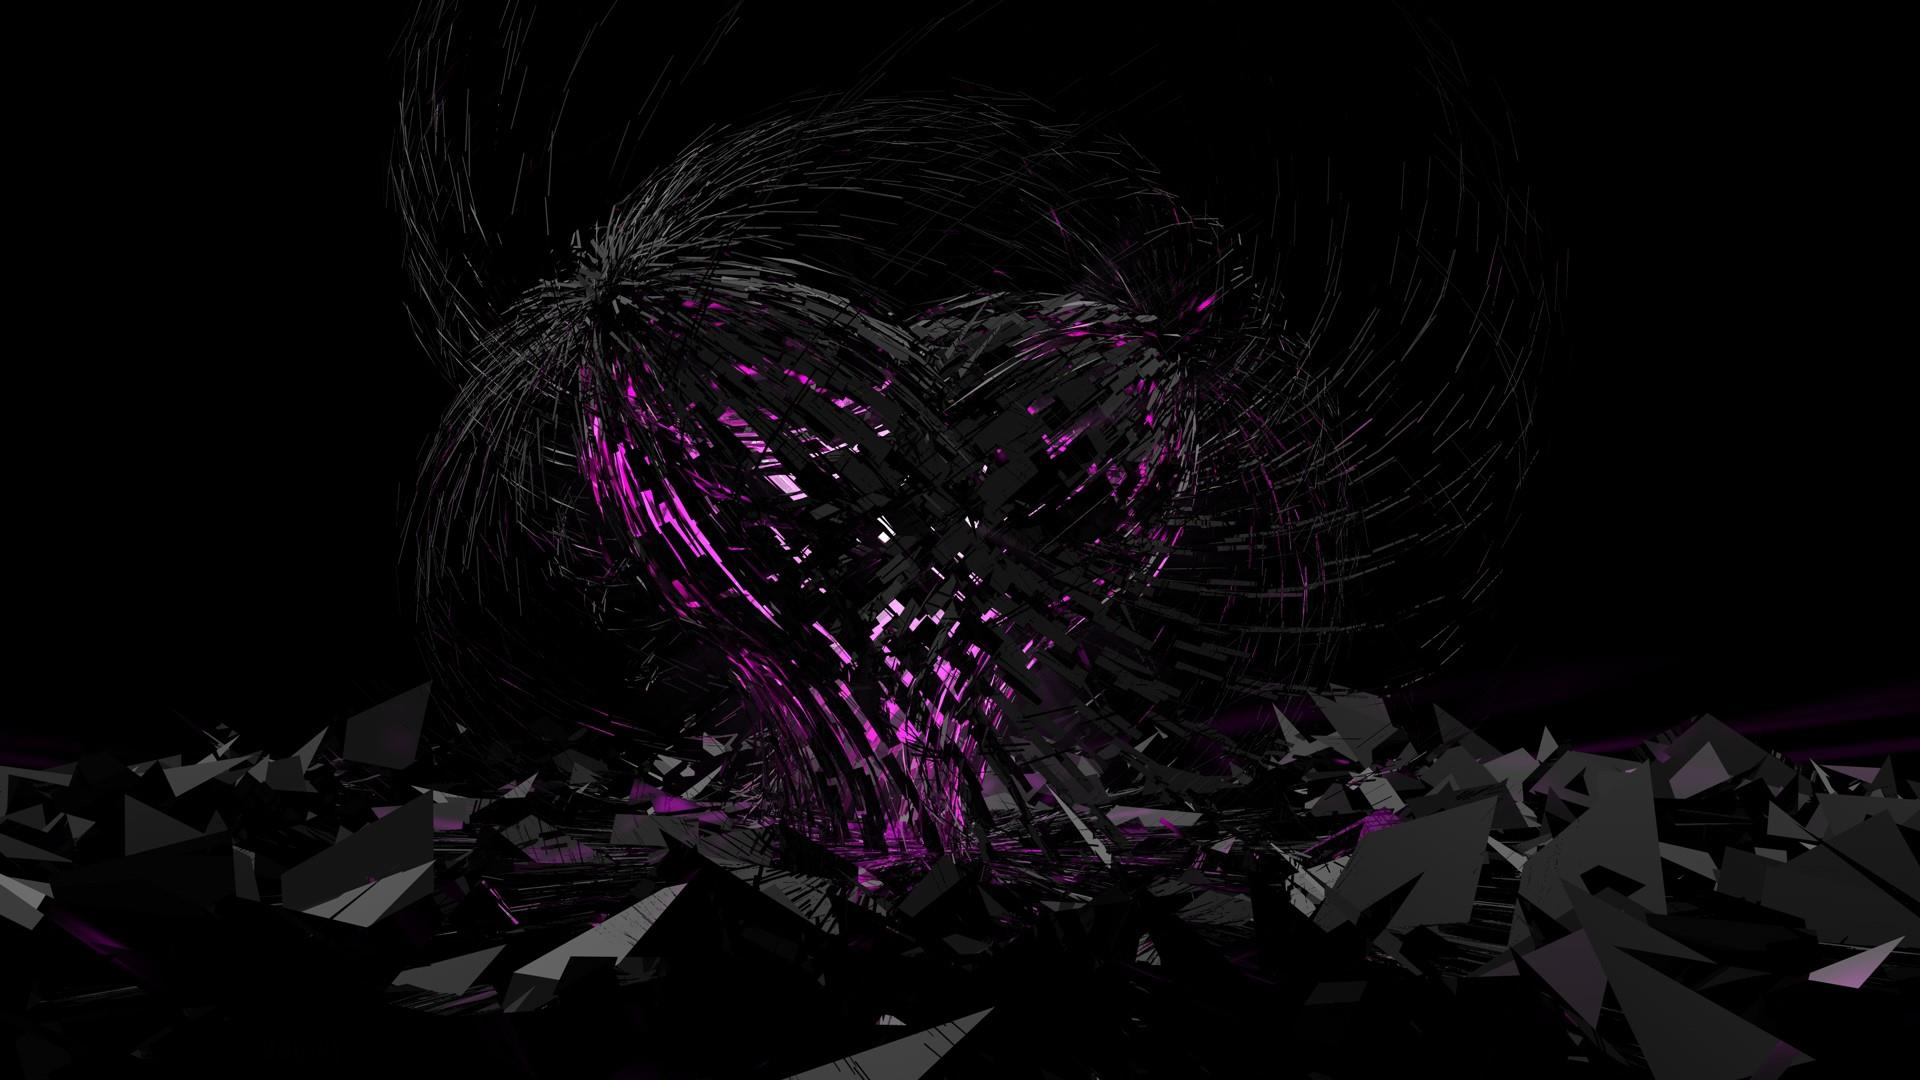 Black heart wallpaper